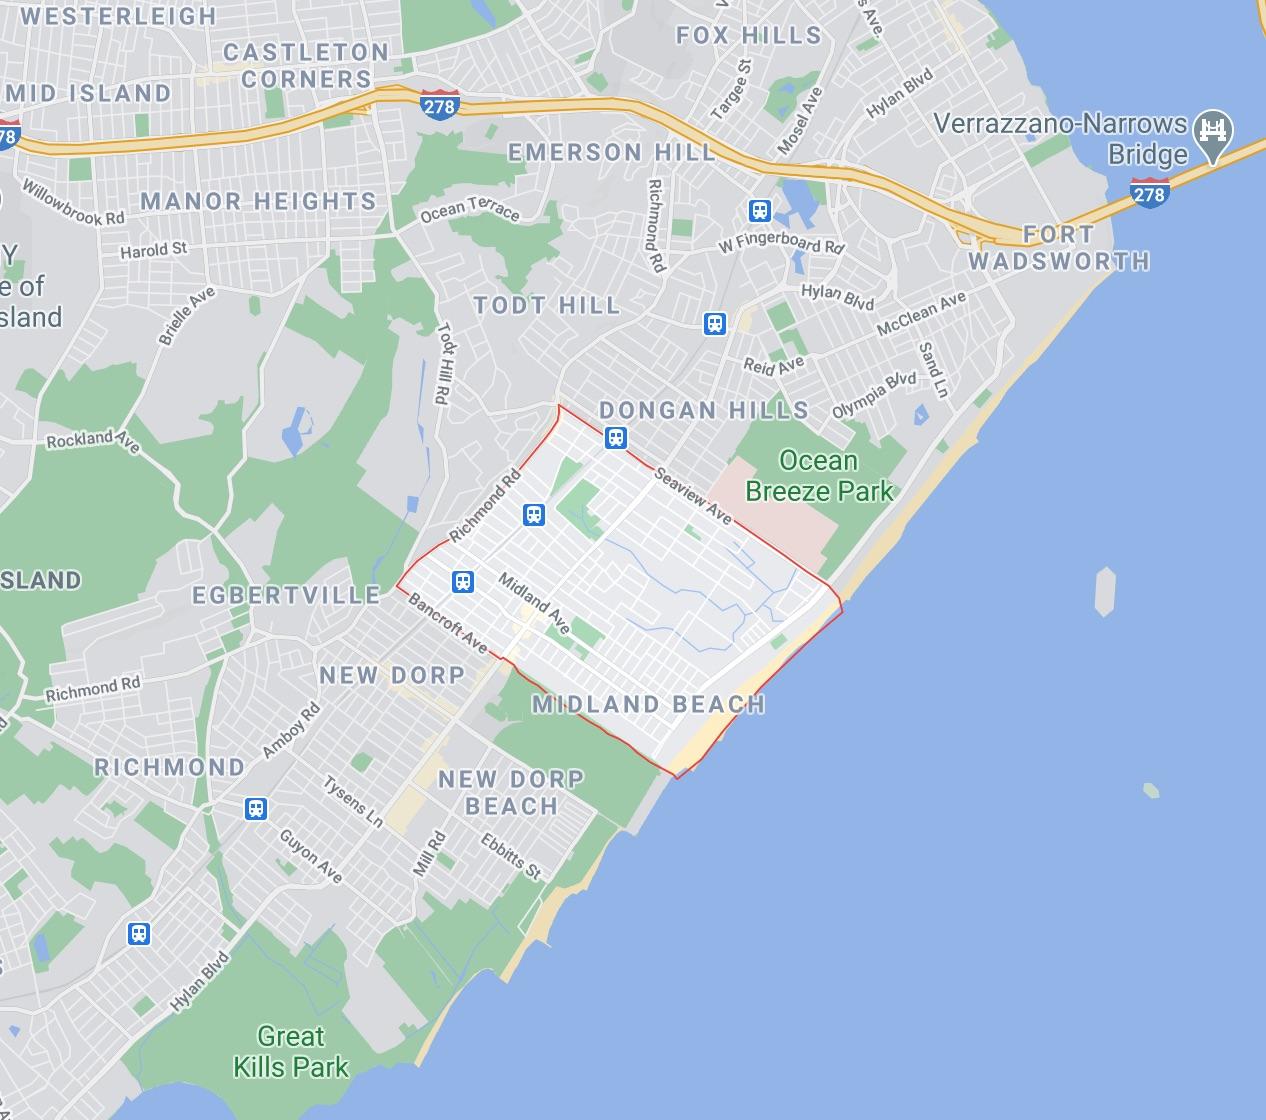 near, Midland, Beach, Midland Beach, NY, New York, long, Island, longisland, pet, store, petstore